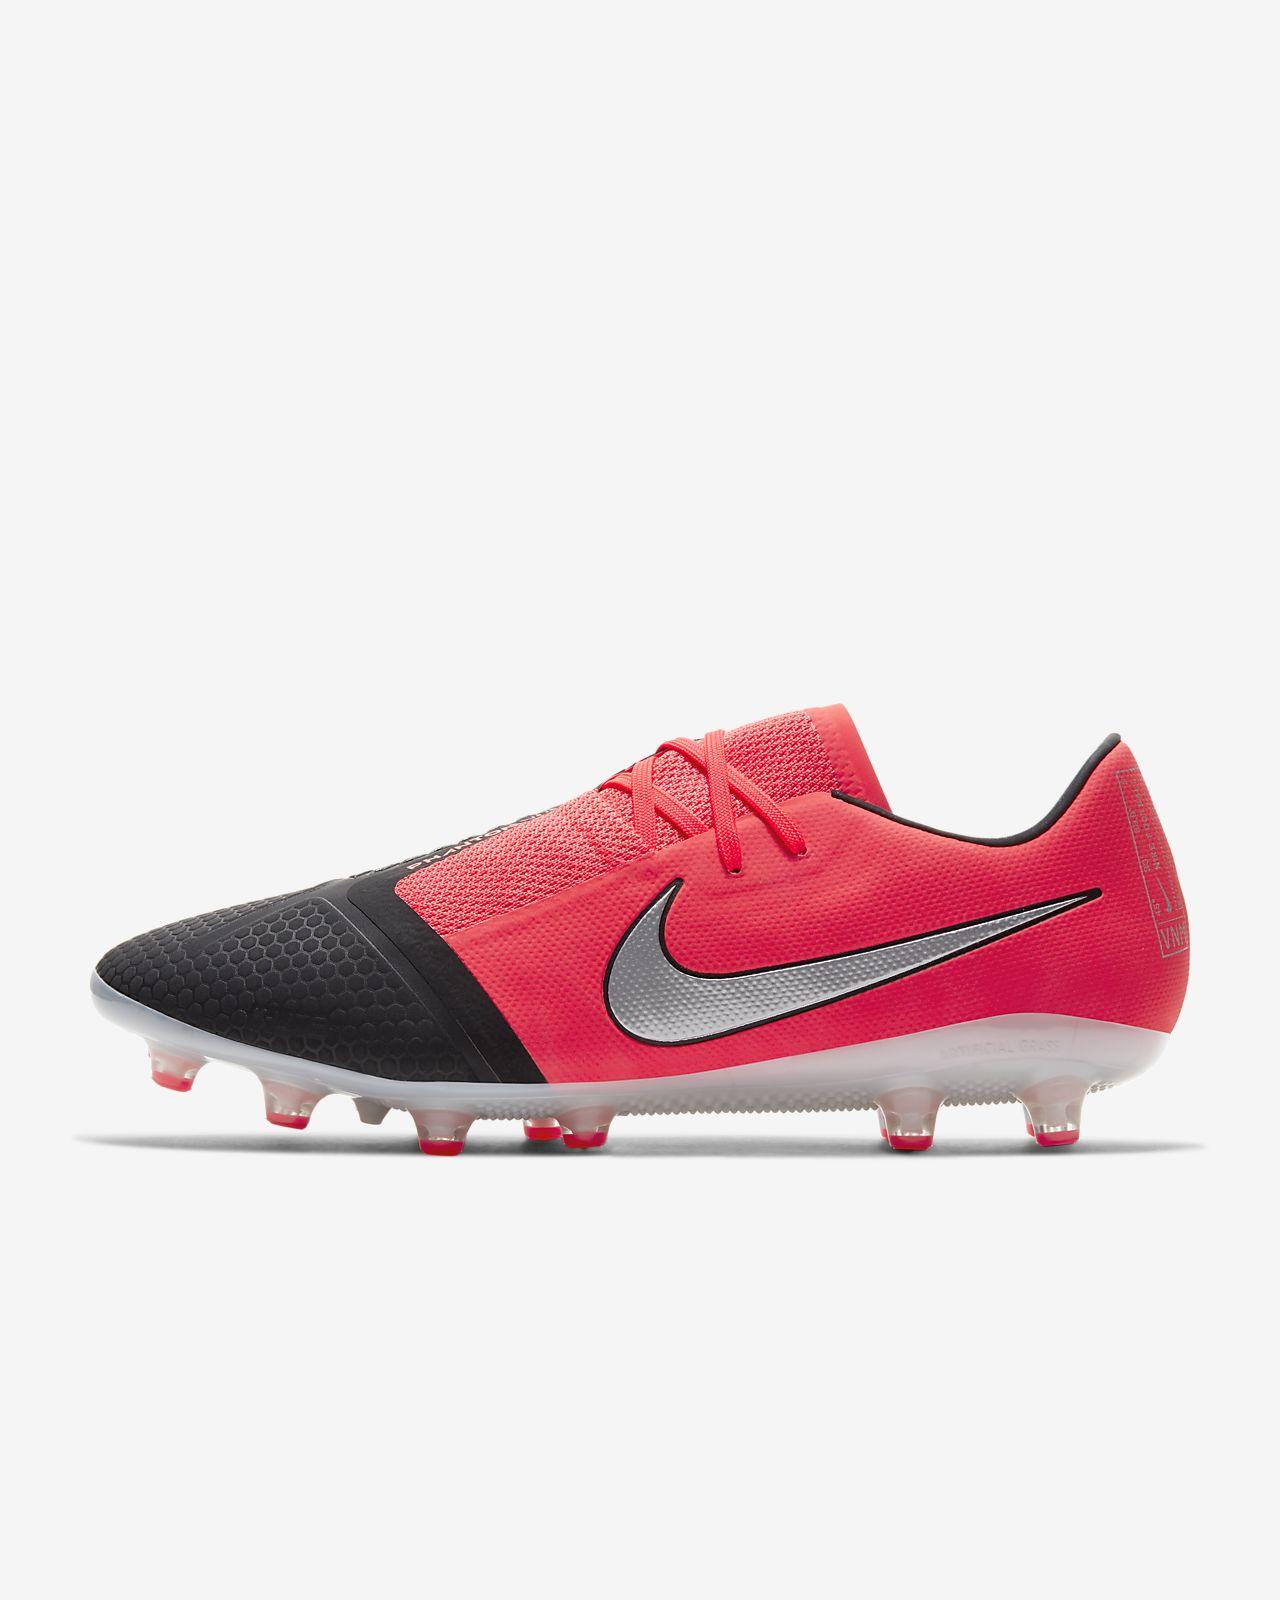 Scarpa da calcio per erba artificiale Nike Phantom Venom Pro AG Pro